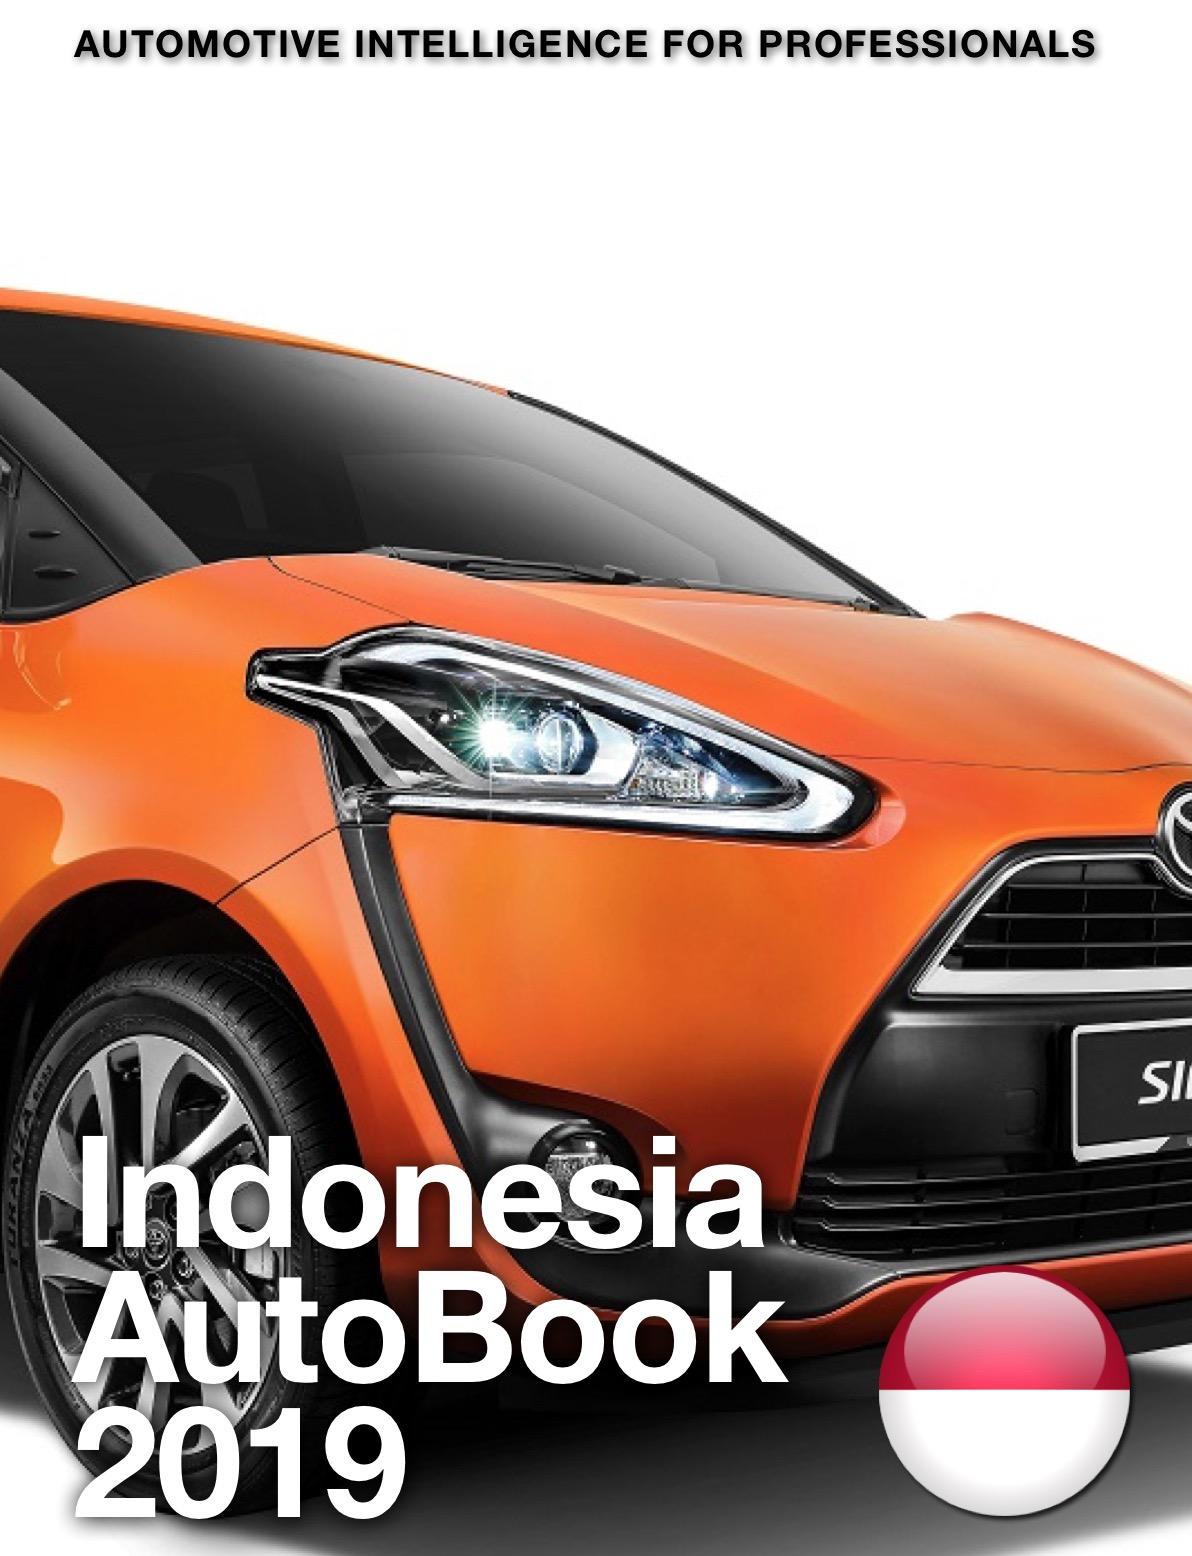 Indonesia AutoBook 2018 1026x1340.jpg